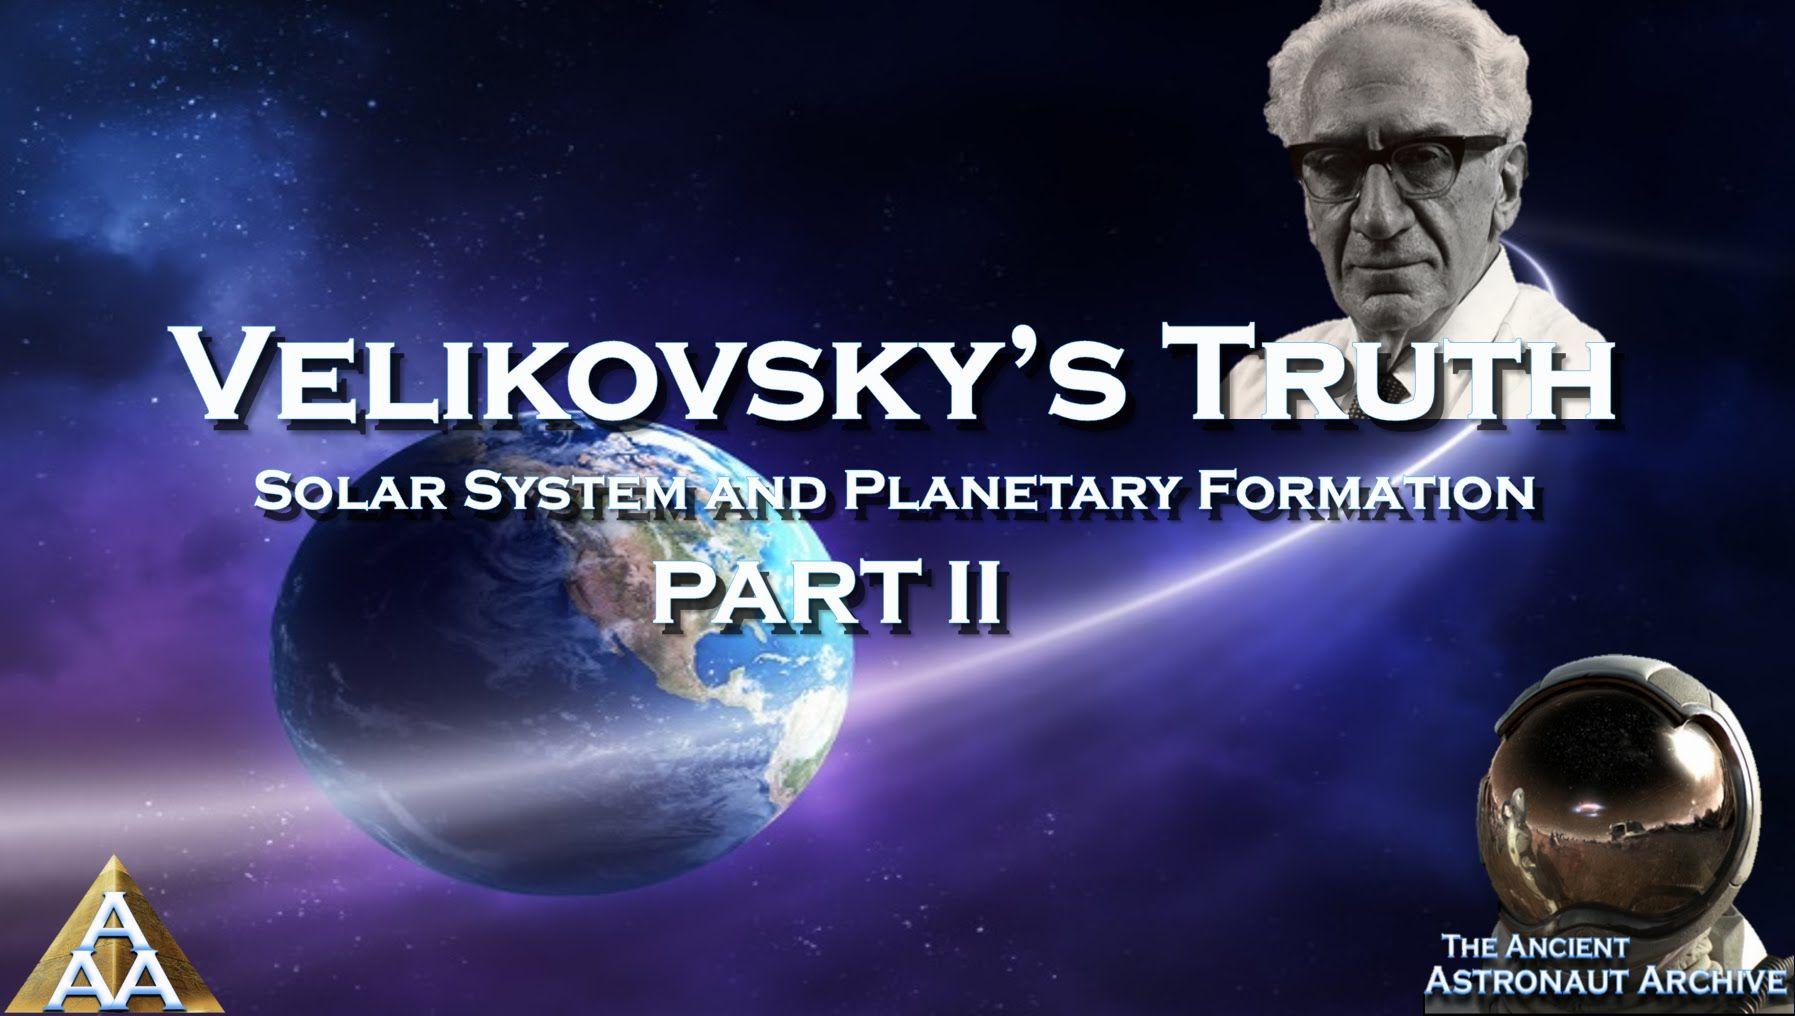 Velikovsky's Truth Solar System and Formation